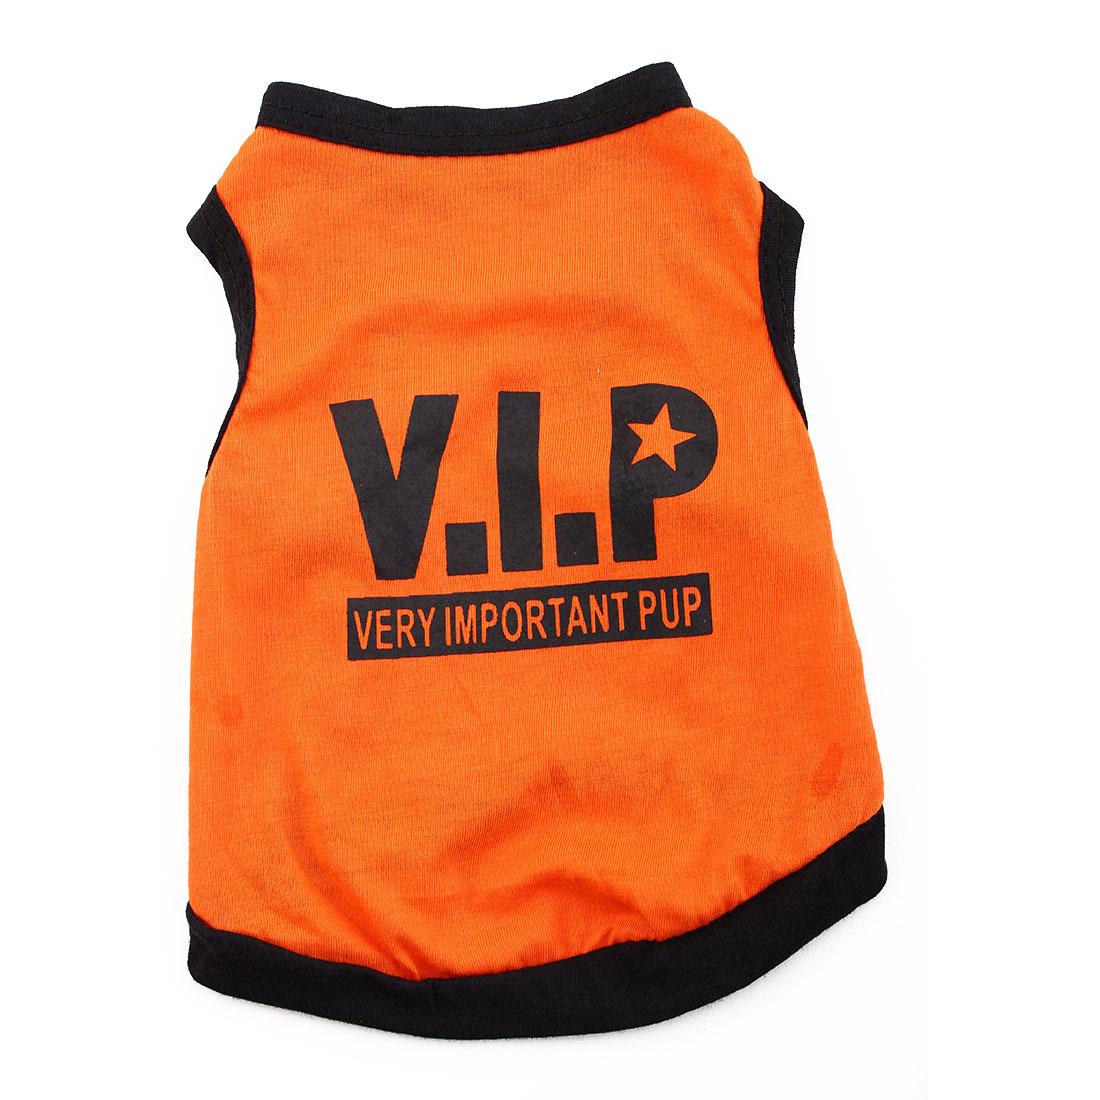 VIP Print Summer Coat Puppy Costume Pet Clothing Small Dog Cat Vest T-shirt Tee Orange Size XS